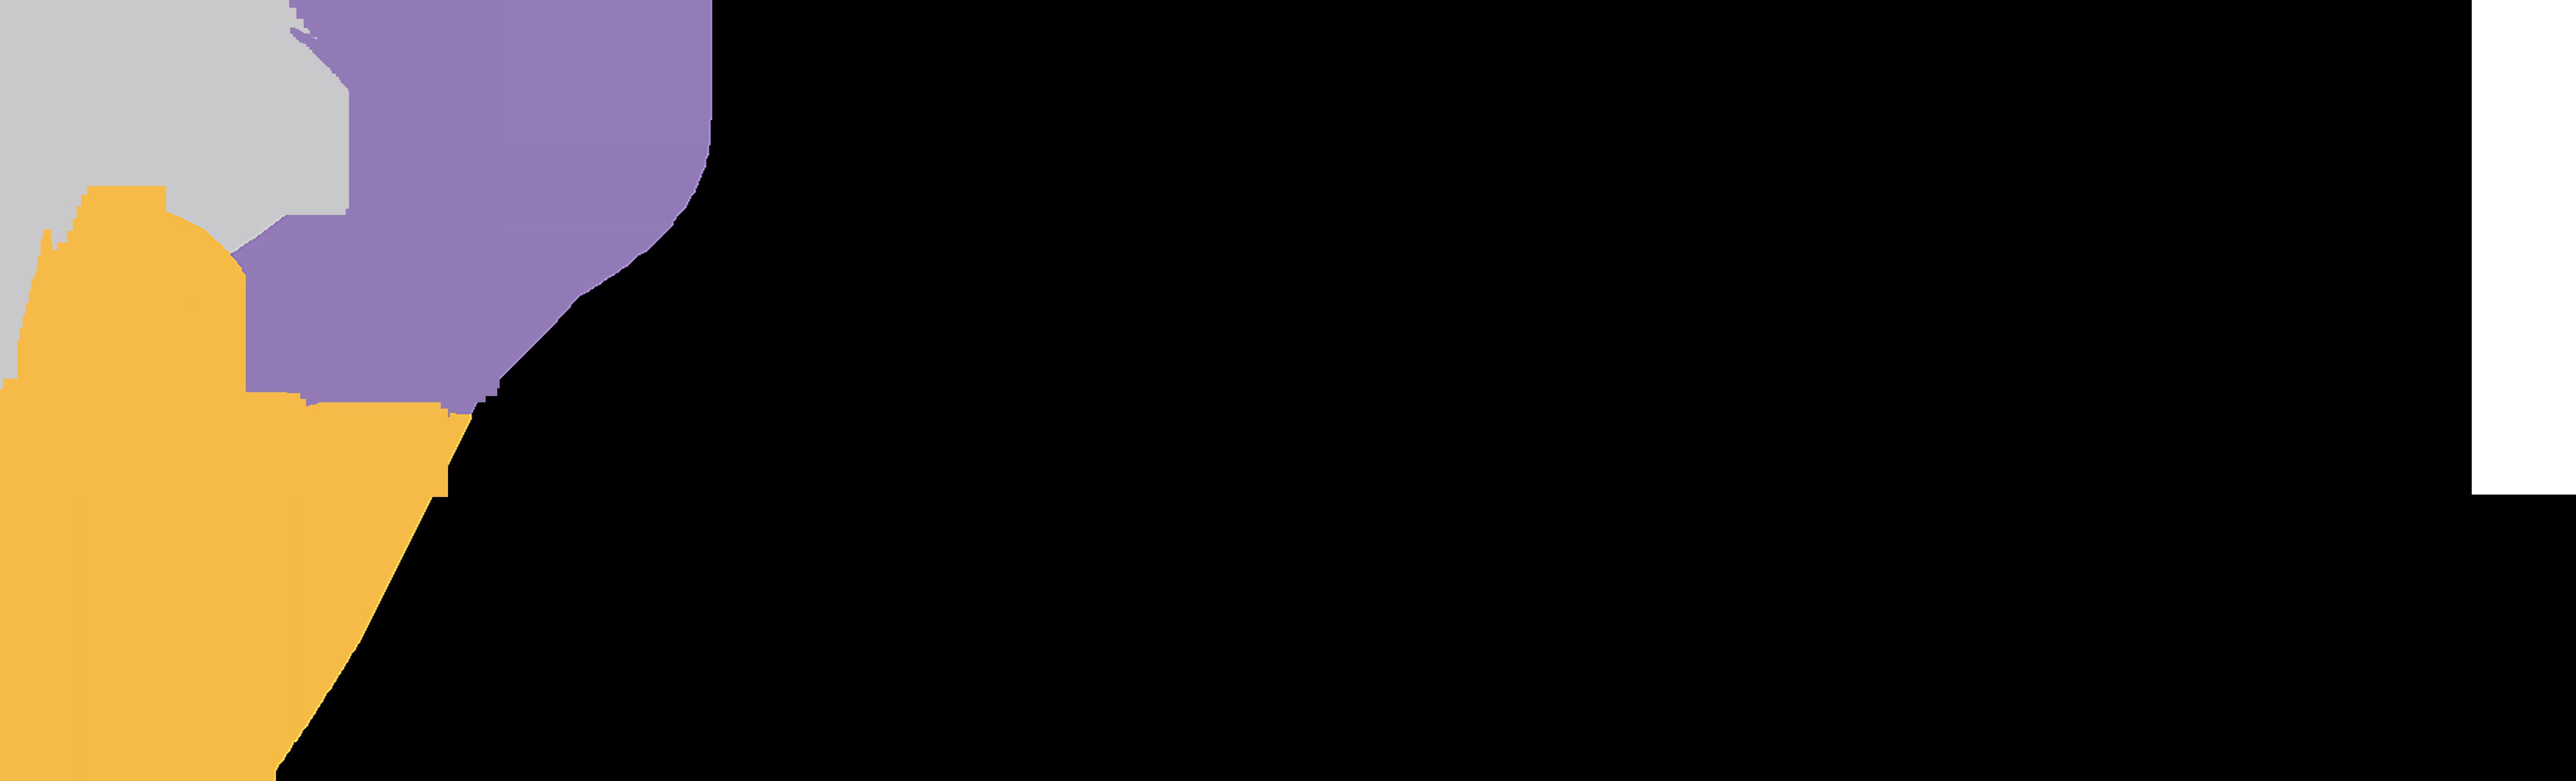 biomatrix-logo